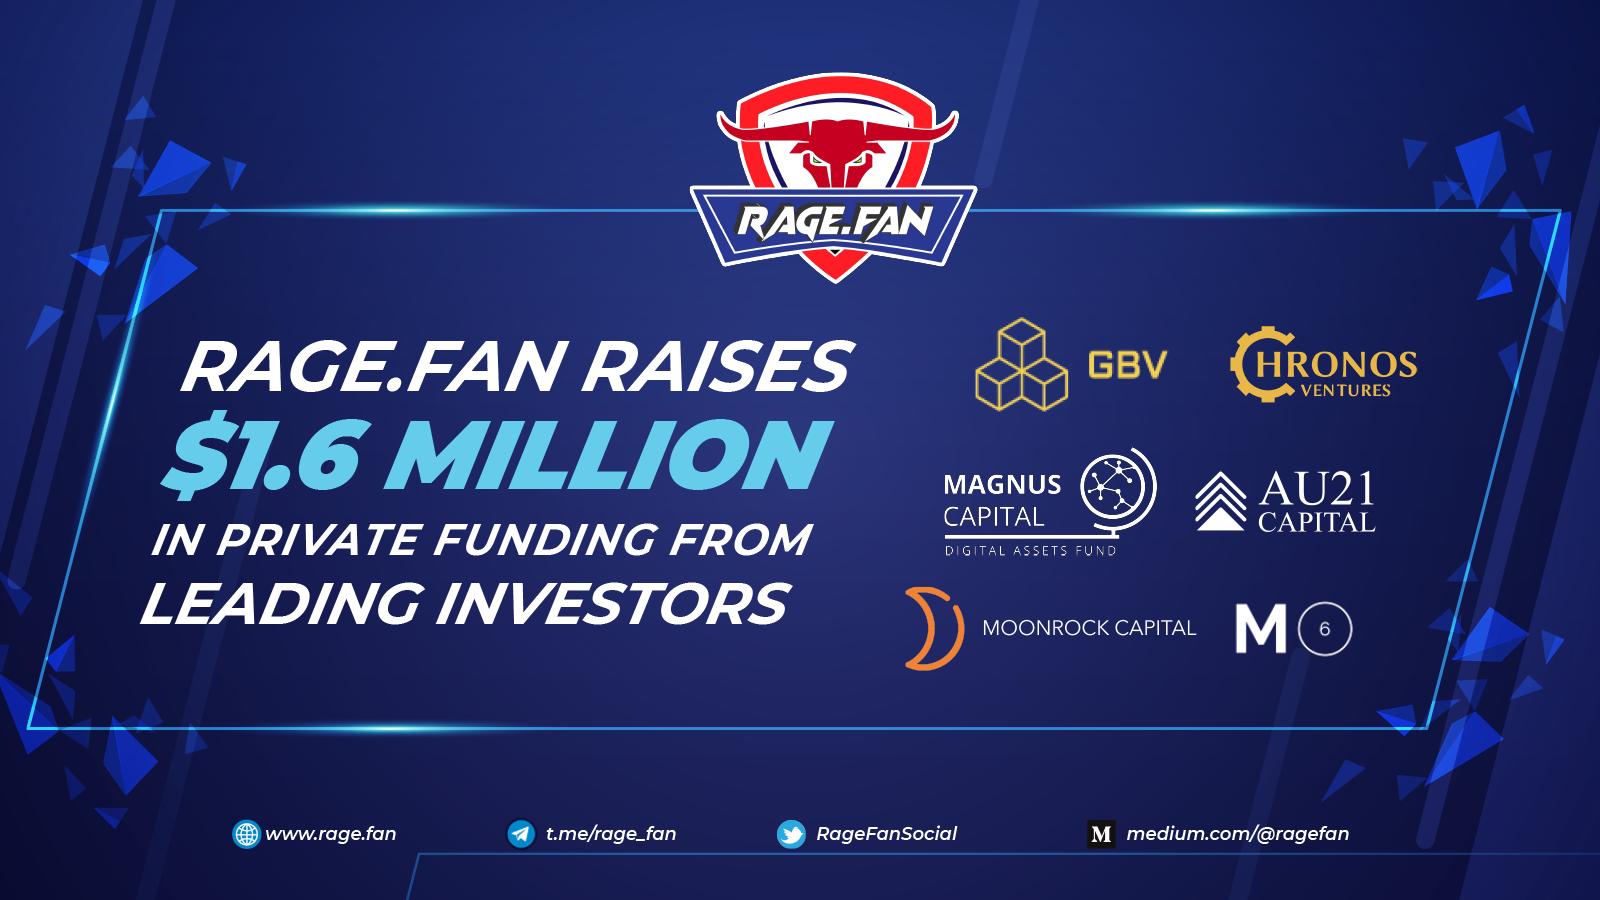 Rage.Fan, a Fan-first Fantasy Sports & uNFT Platform, Successfully Raises $1.6M From Leading Investors